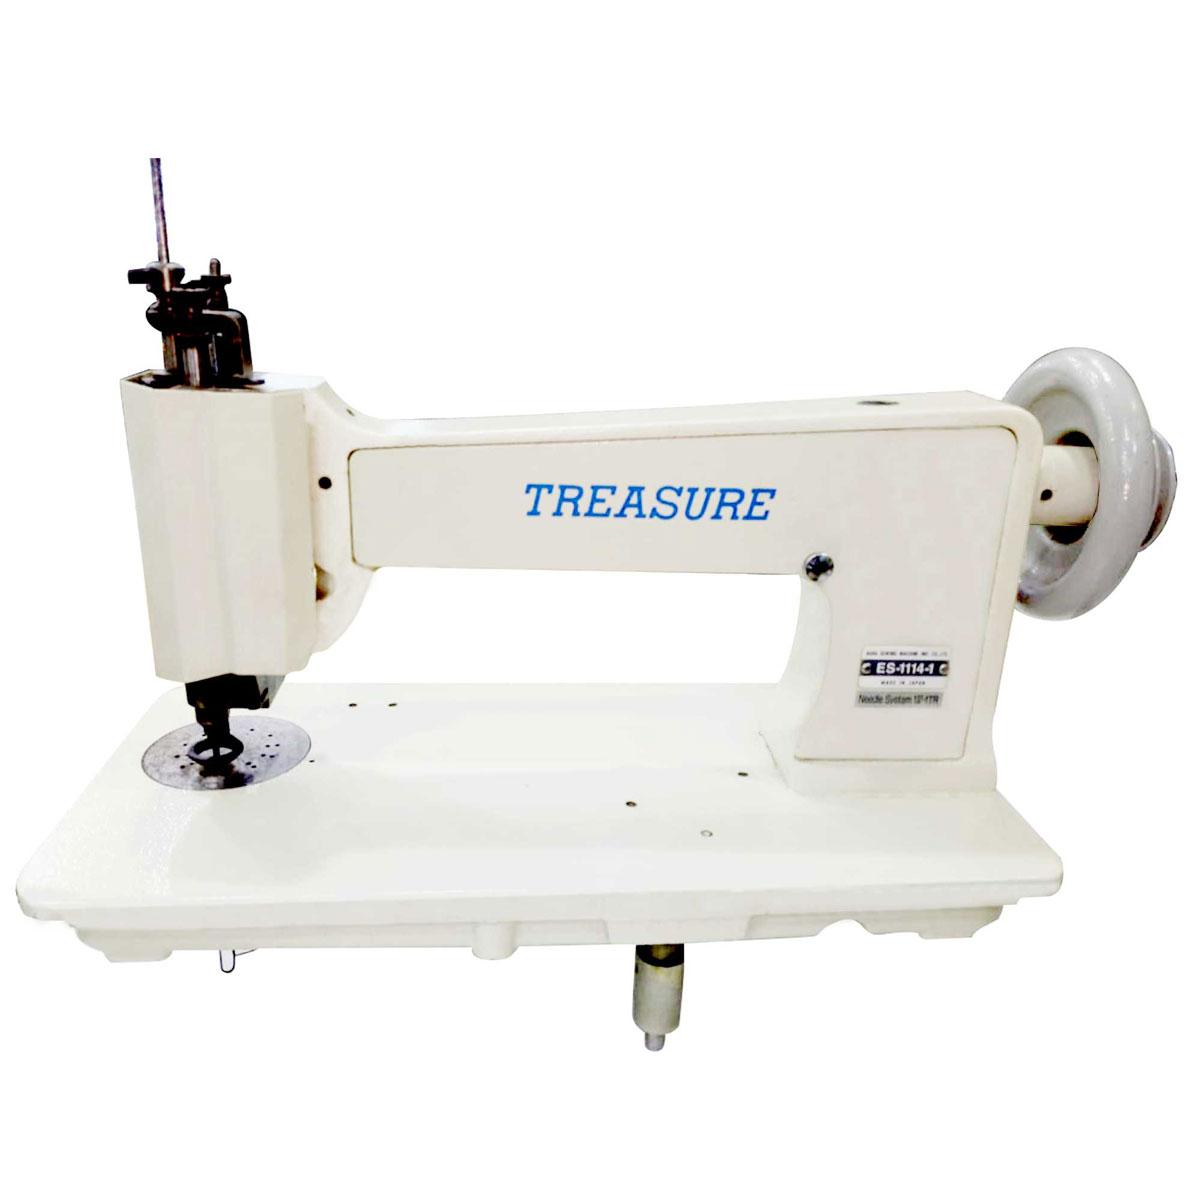 Treasure ES-1114-1 Handle Operating Chain-Stitch ...